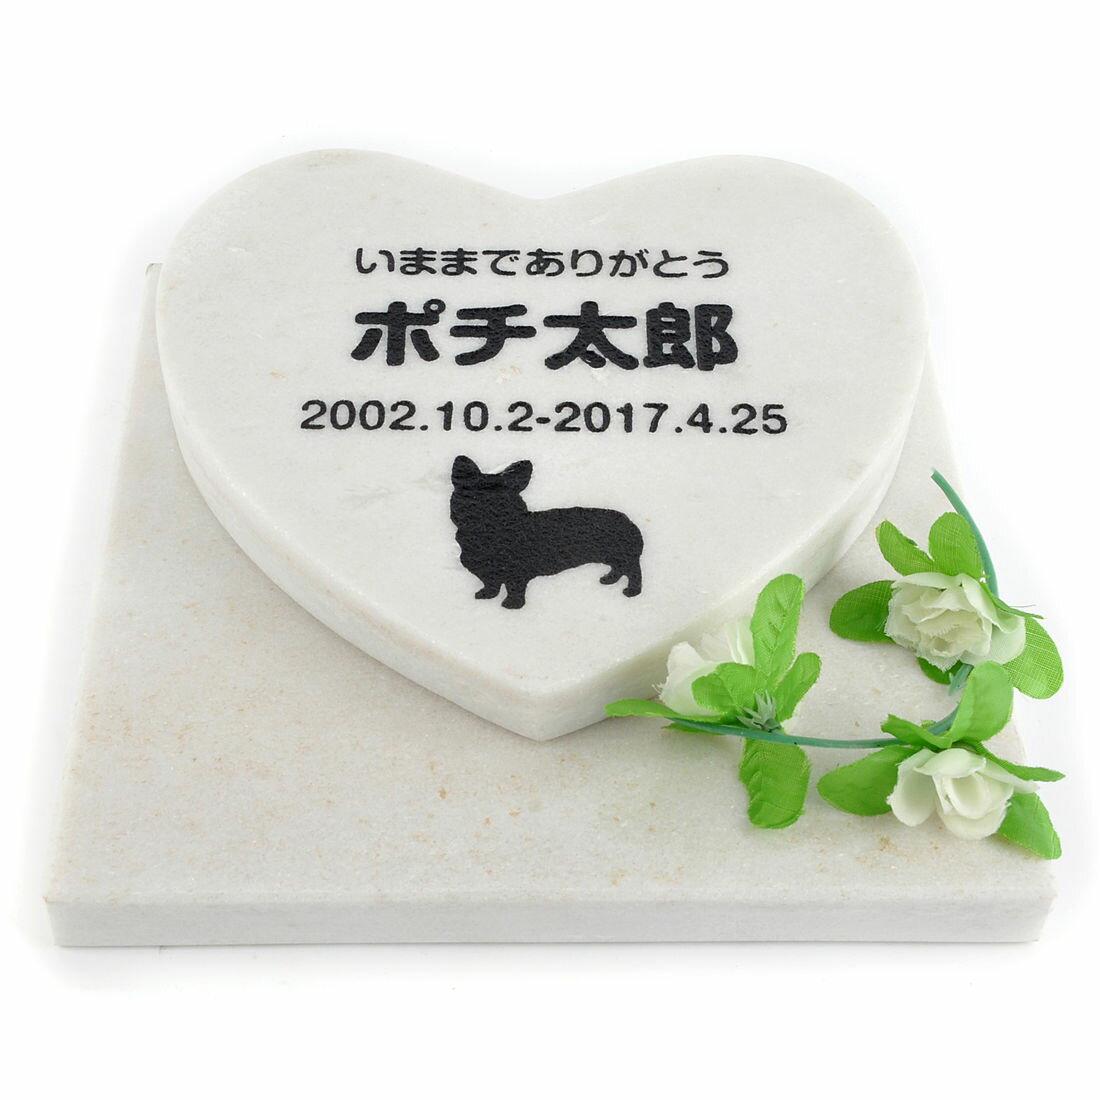 Pet&Love. ペットのお墓 天然石製 セット型 御影石 ホワイト ハート 【HLS_DU】【RCP】【楽ギフ_包装】【楽ギフ_名入れ】 attr131attr ctgr2ctgr sml3sml+ctgr2ctgr DOG